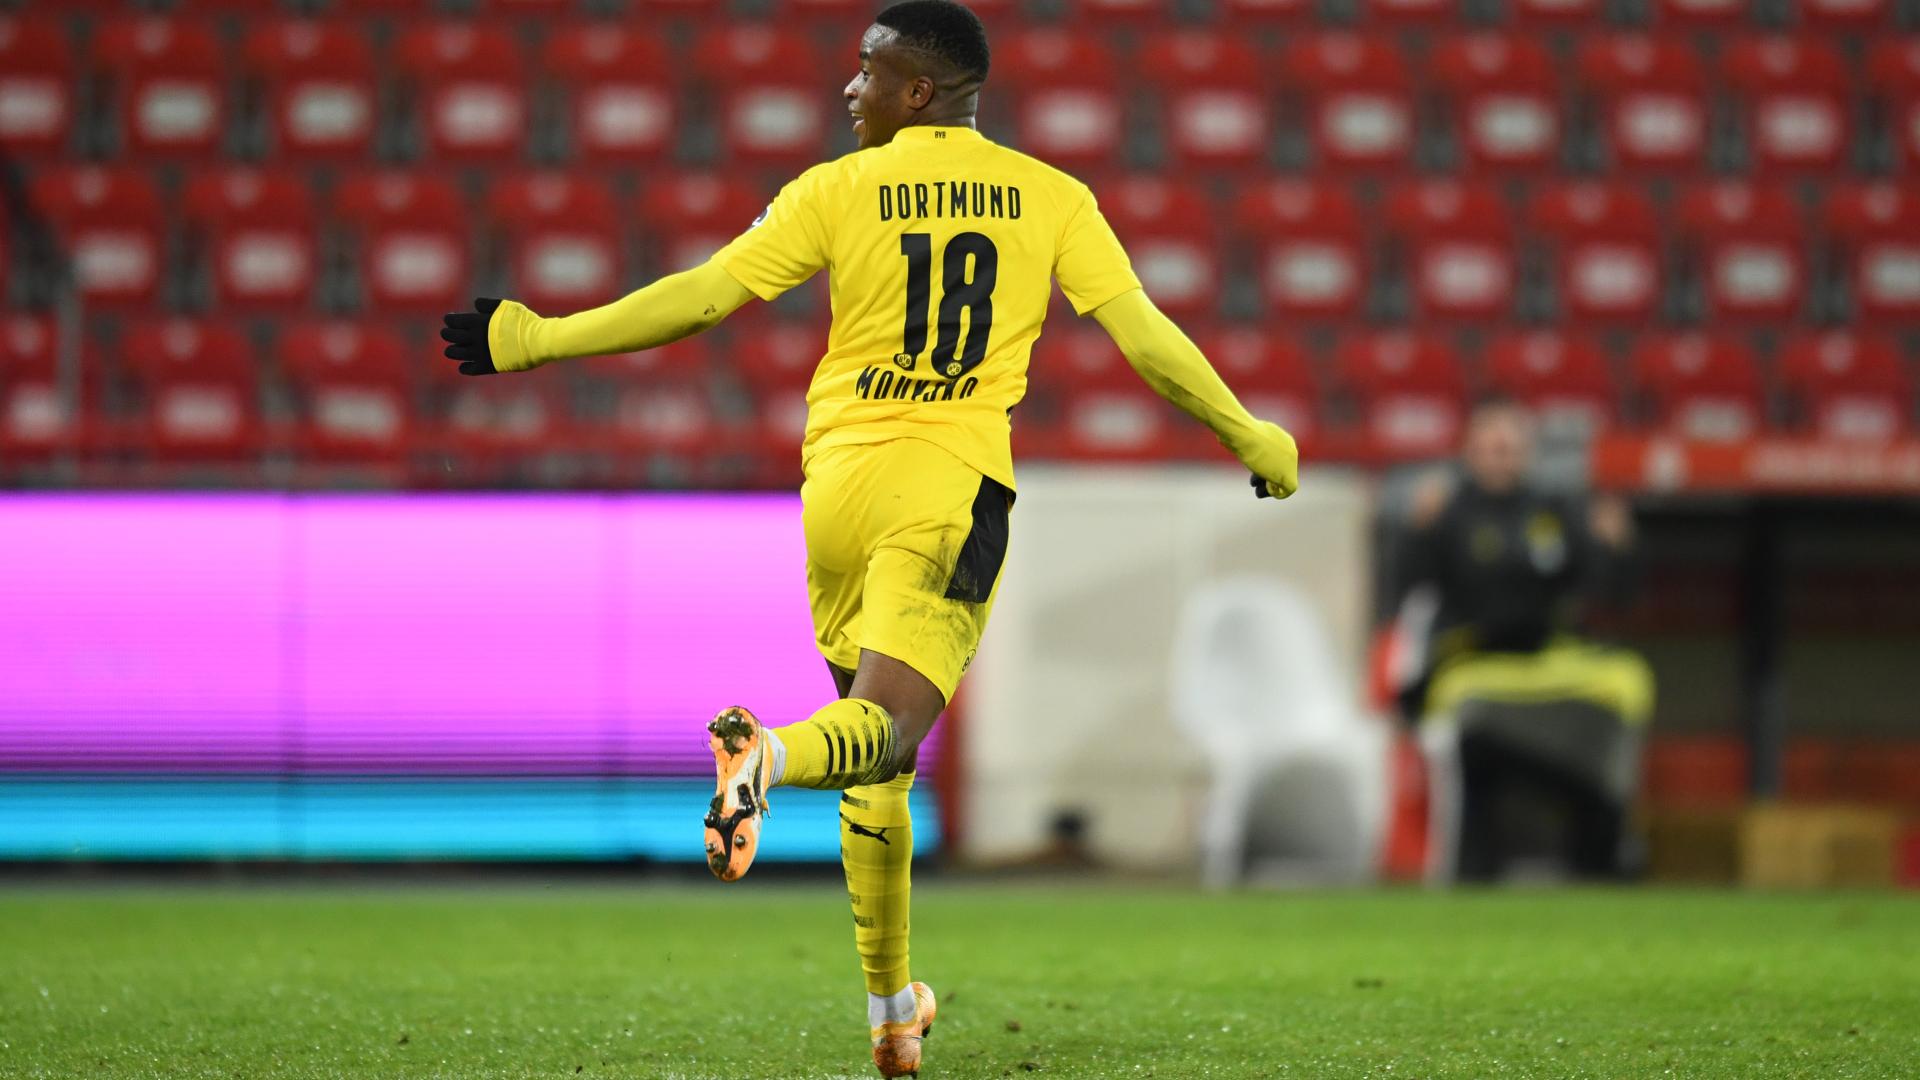 Moukoko Becomes Youngest Bundesliga Scorer But Dortmund Lose To Berlin